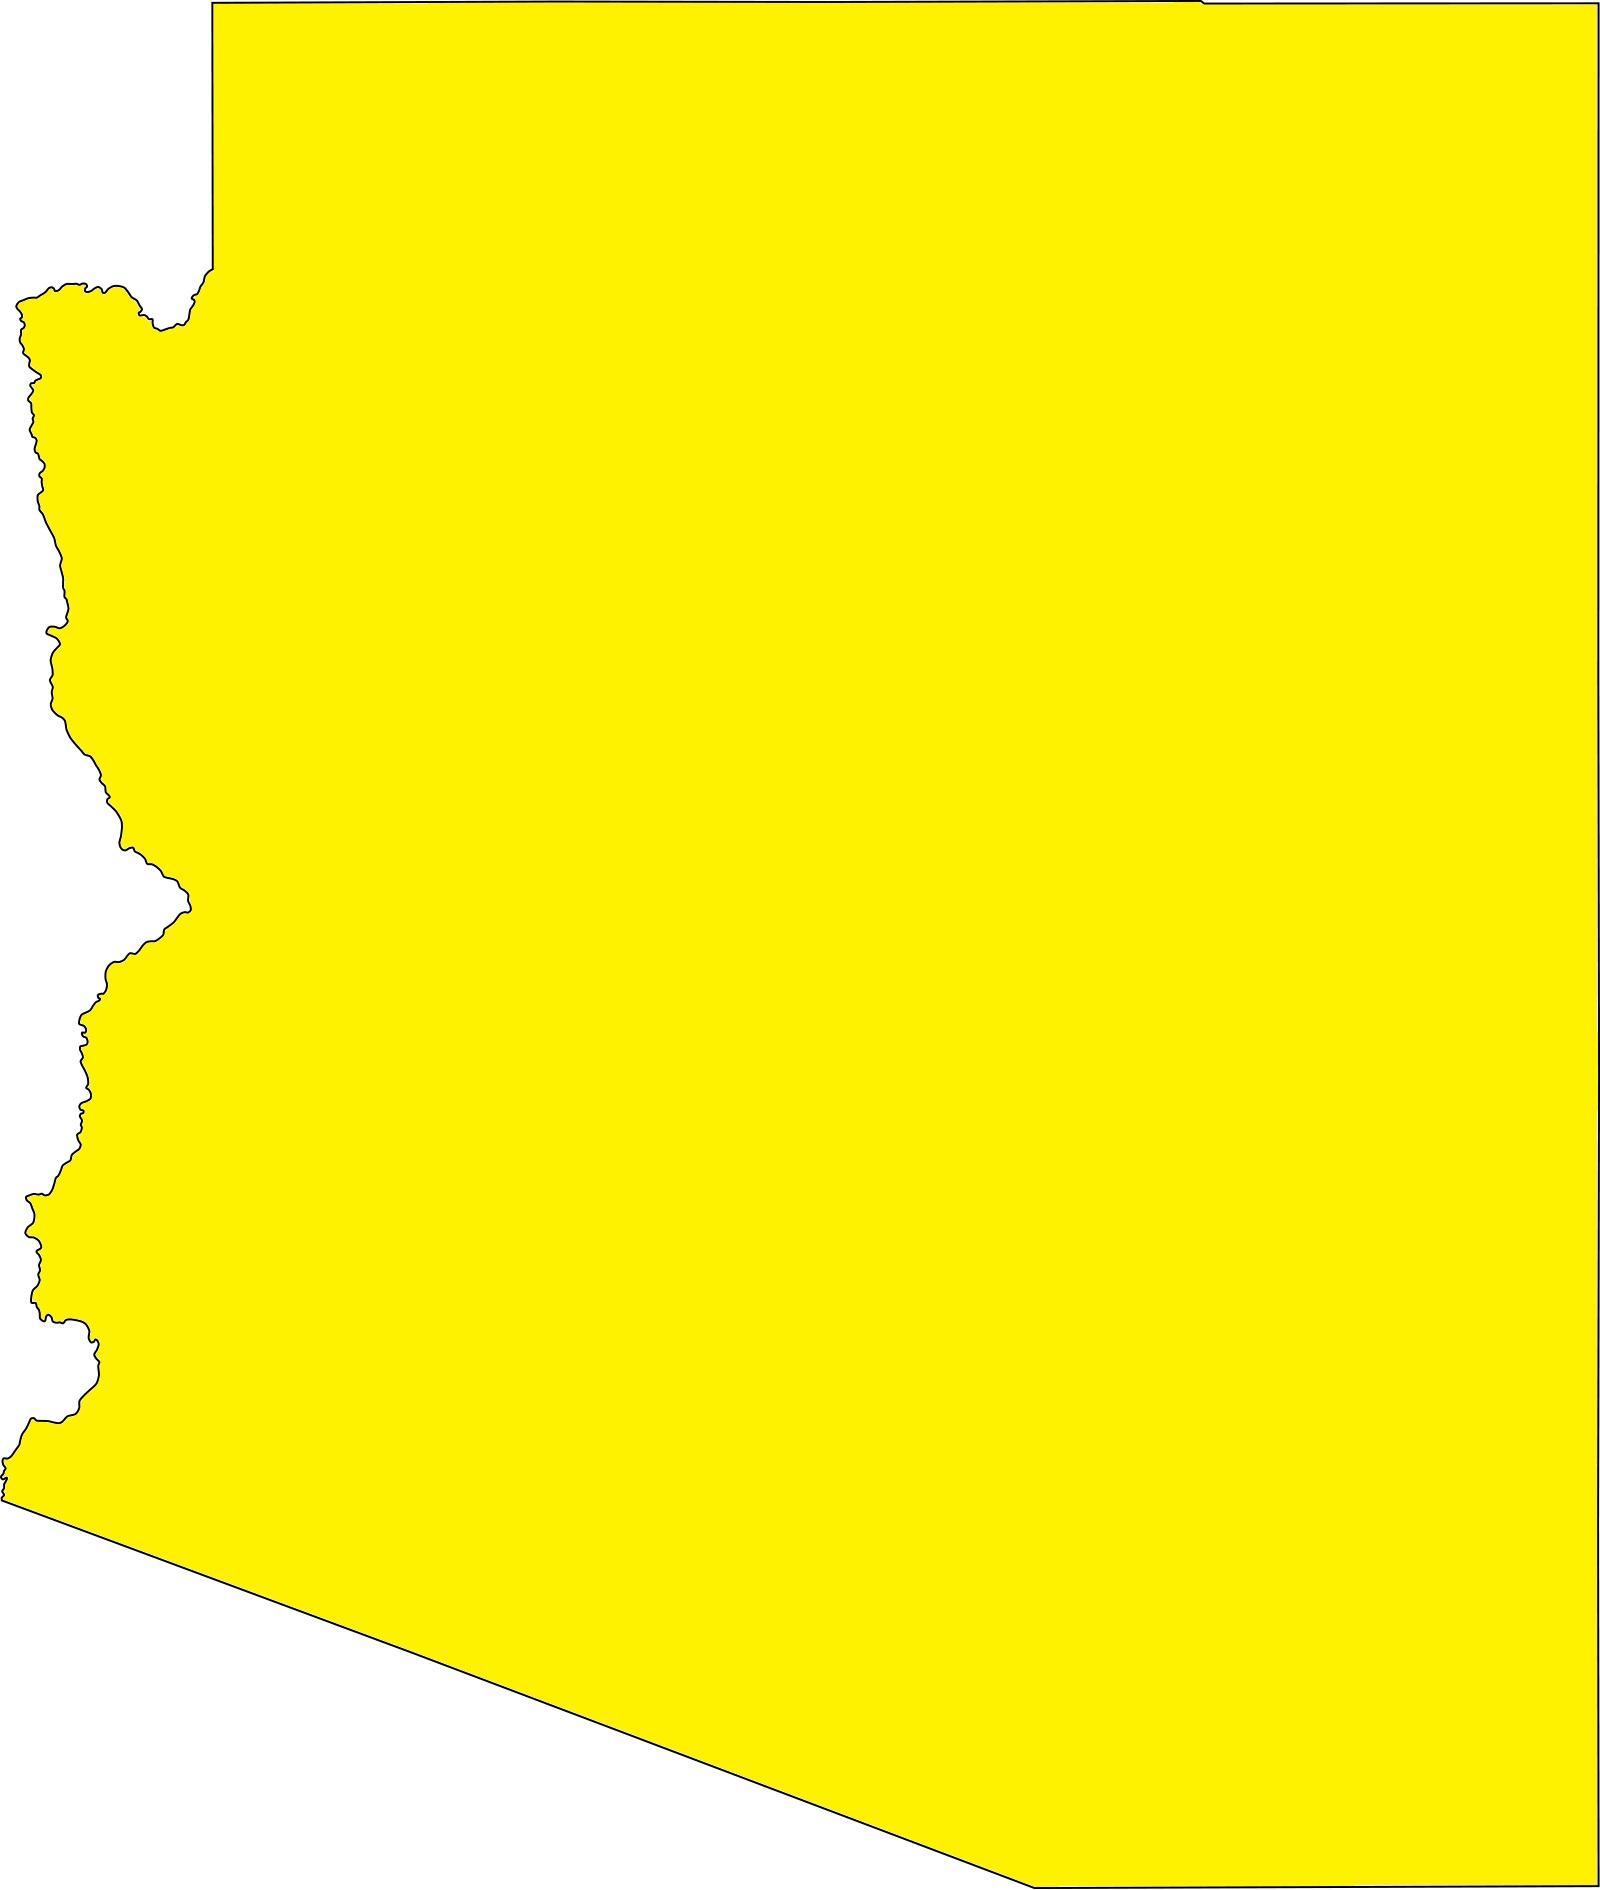 Arizona Blank Outline Map   Blank Outline Map of Arizona – 2